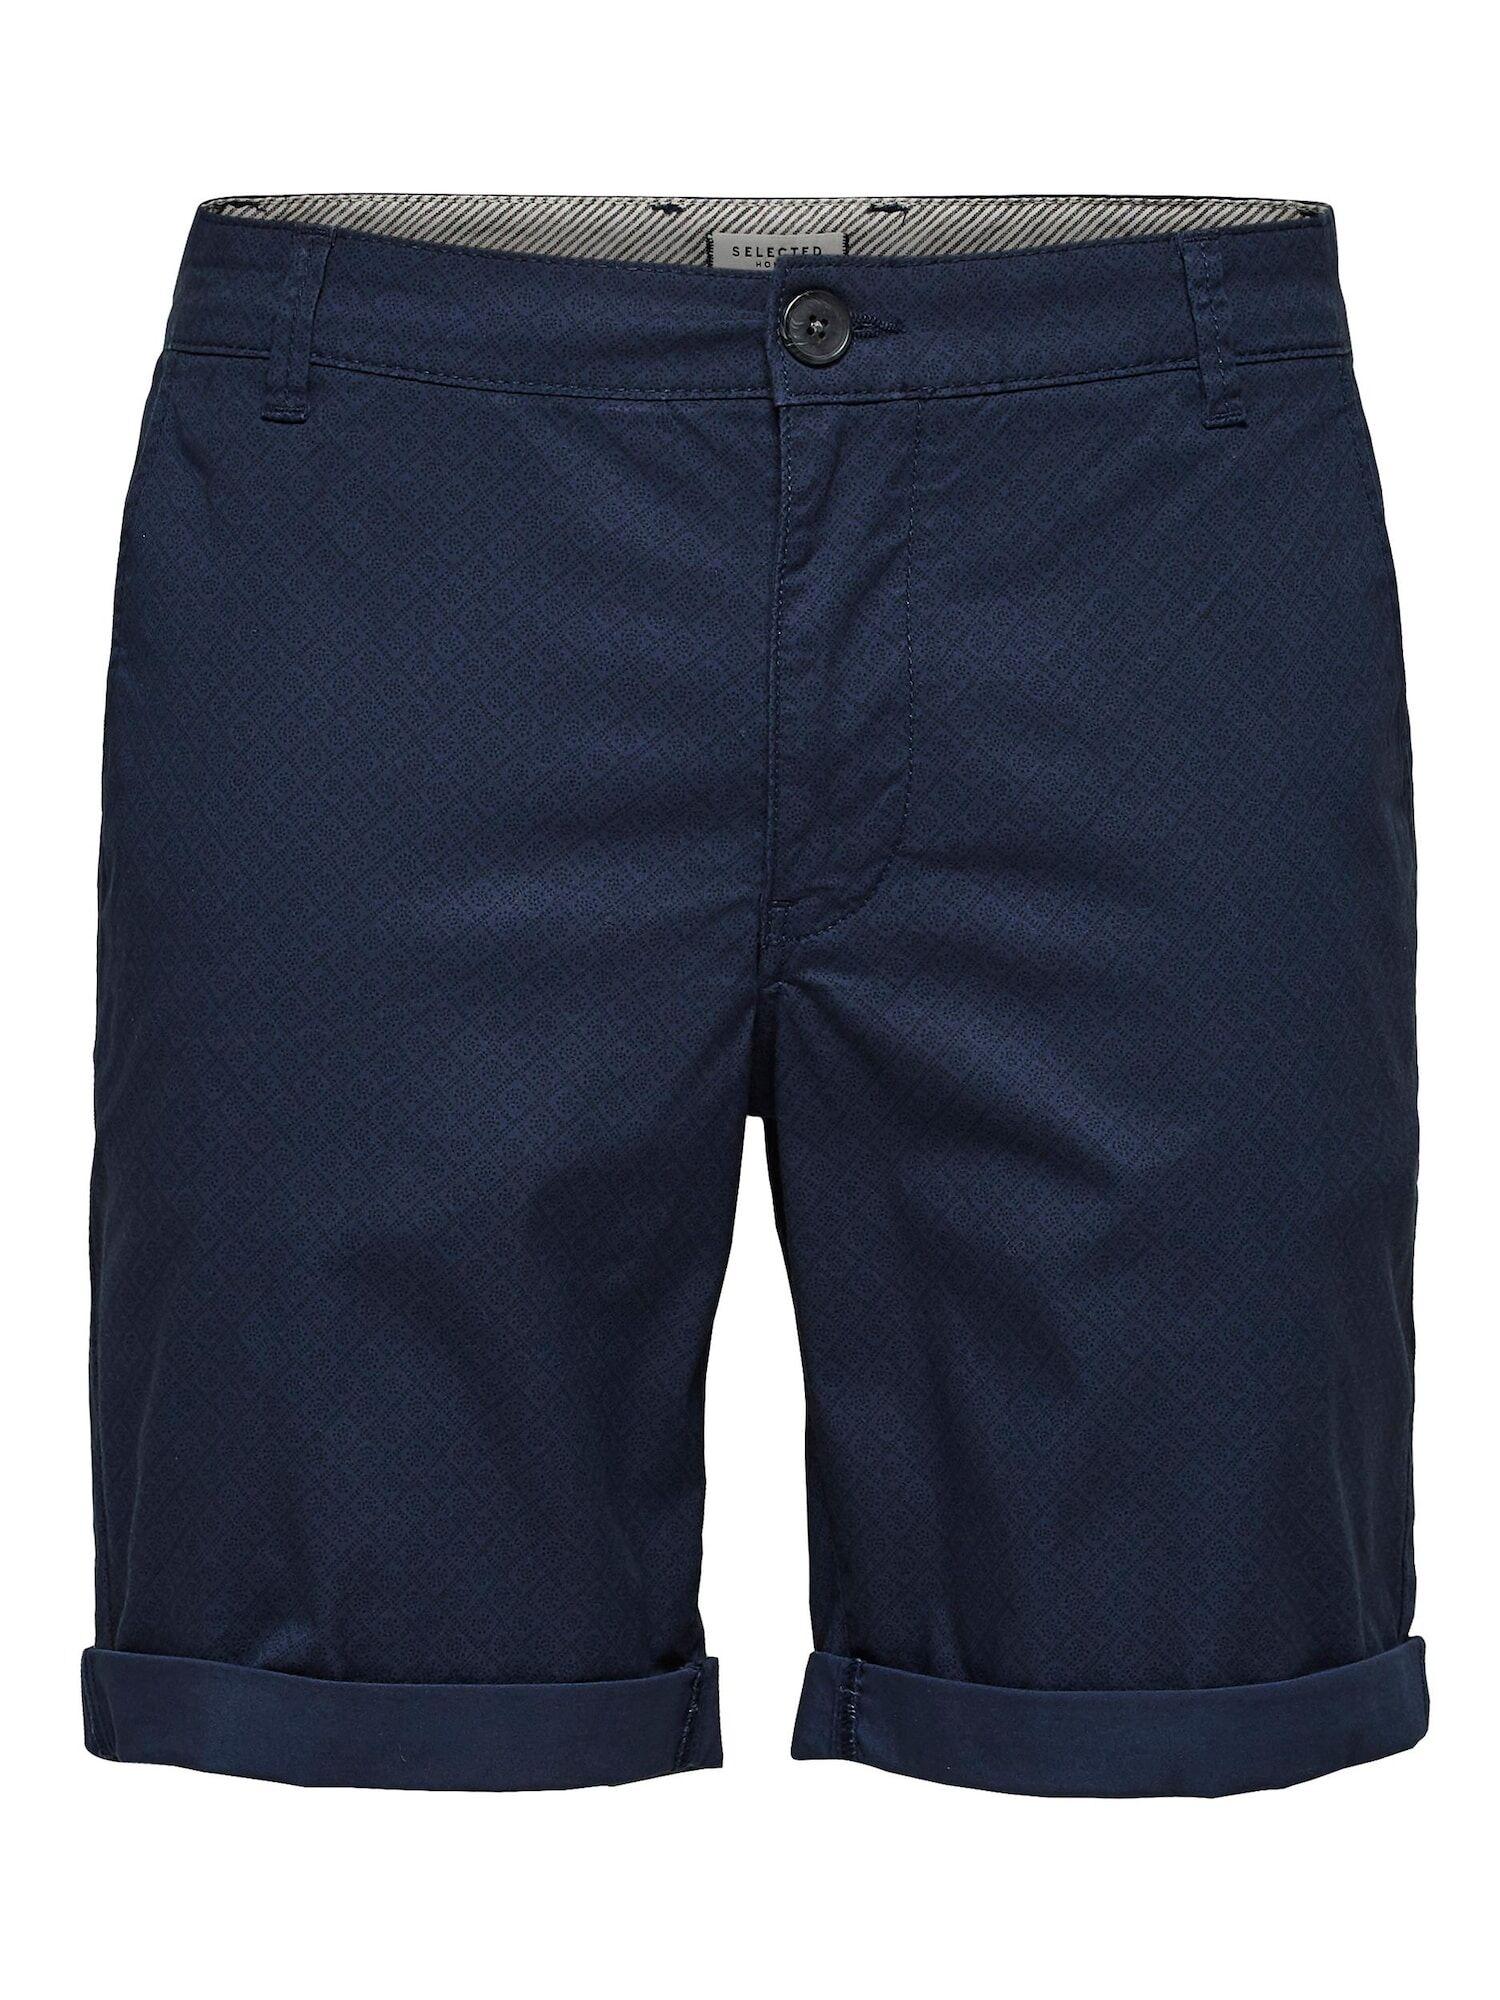 SELECTED HOMME Pantalon chino 'Paris'  - Bleu - Taille: M - male